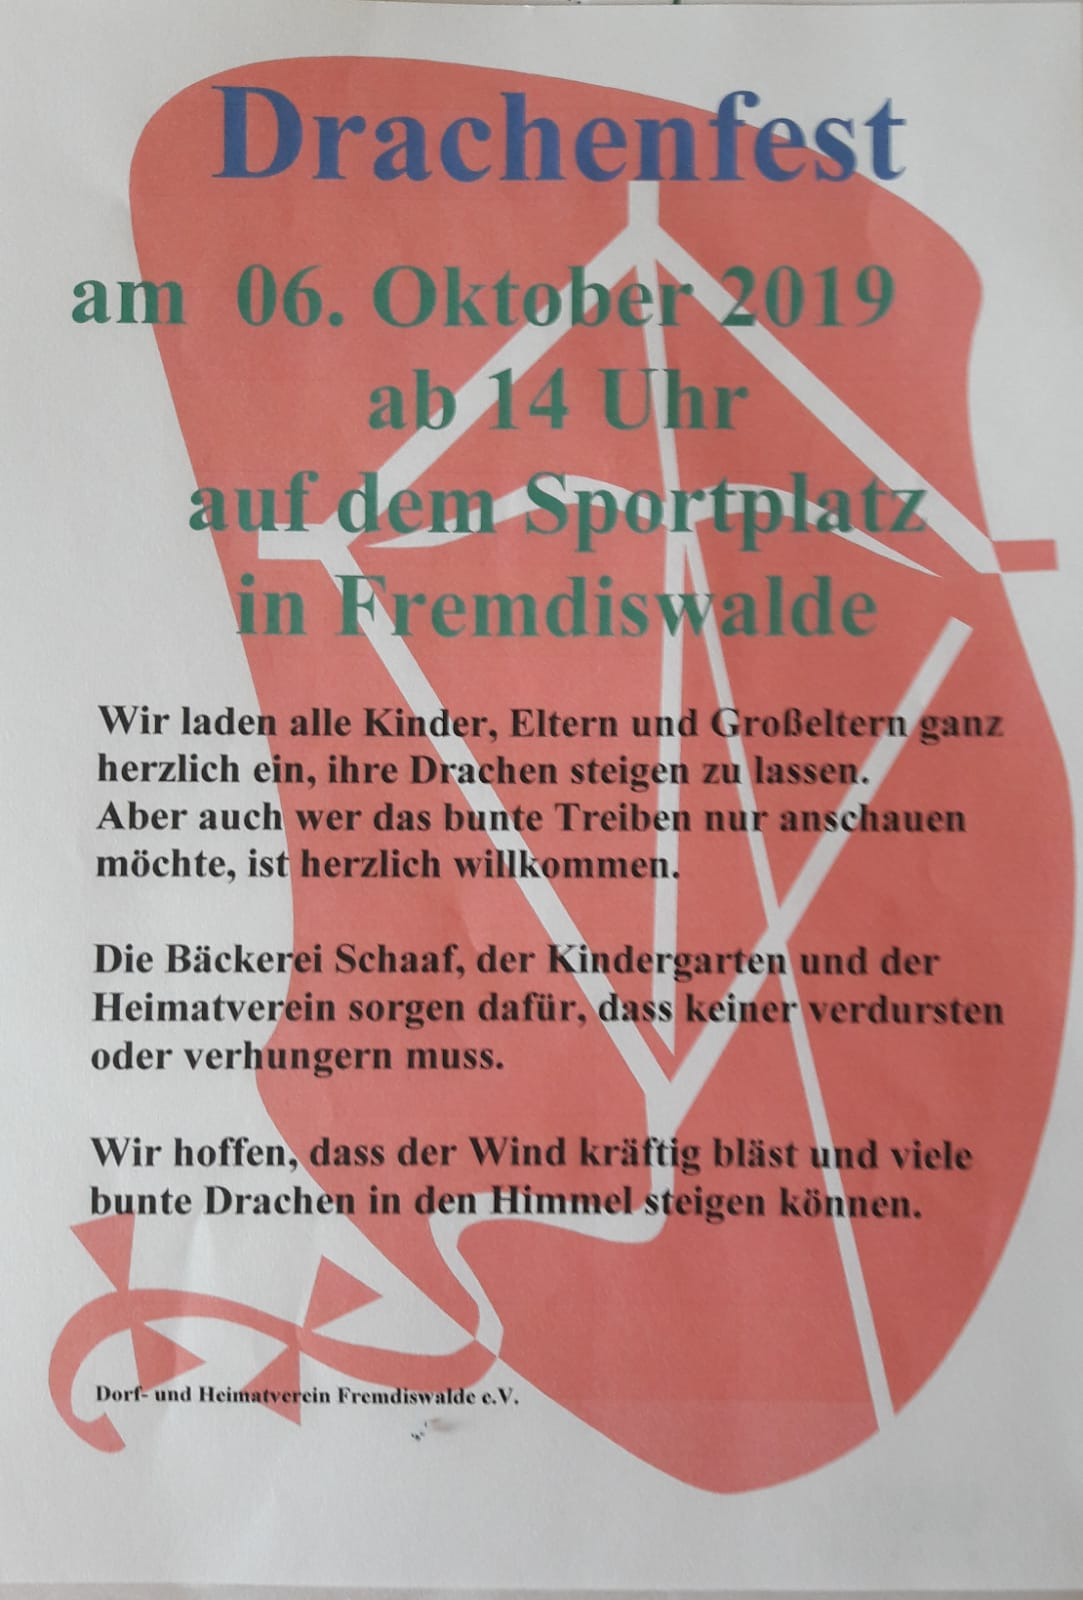 Drachenfest @ Sportplatz Fremdiswalde